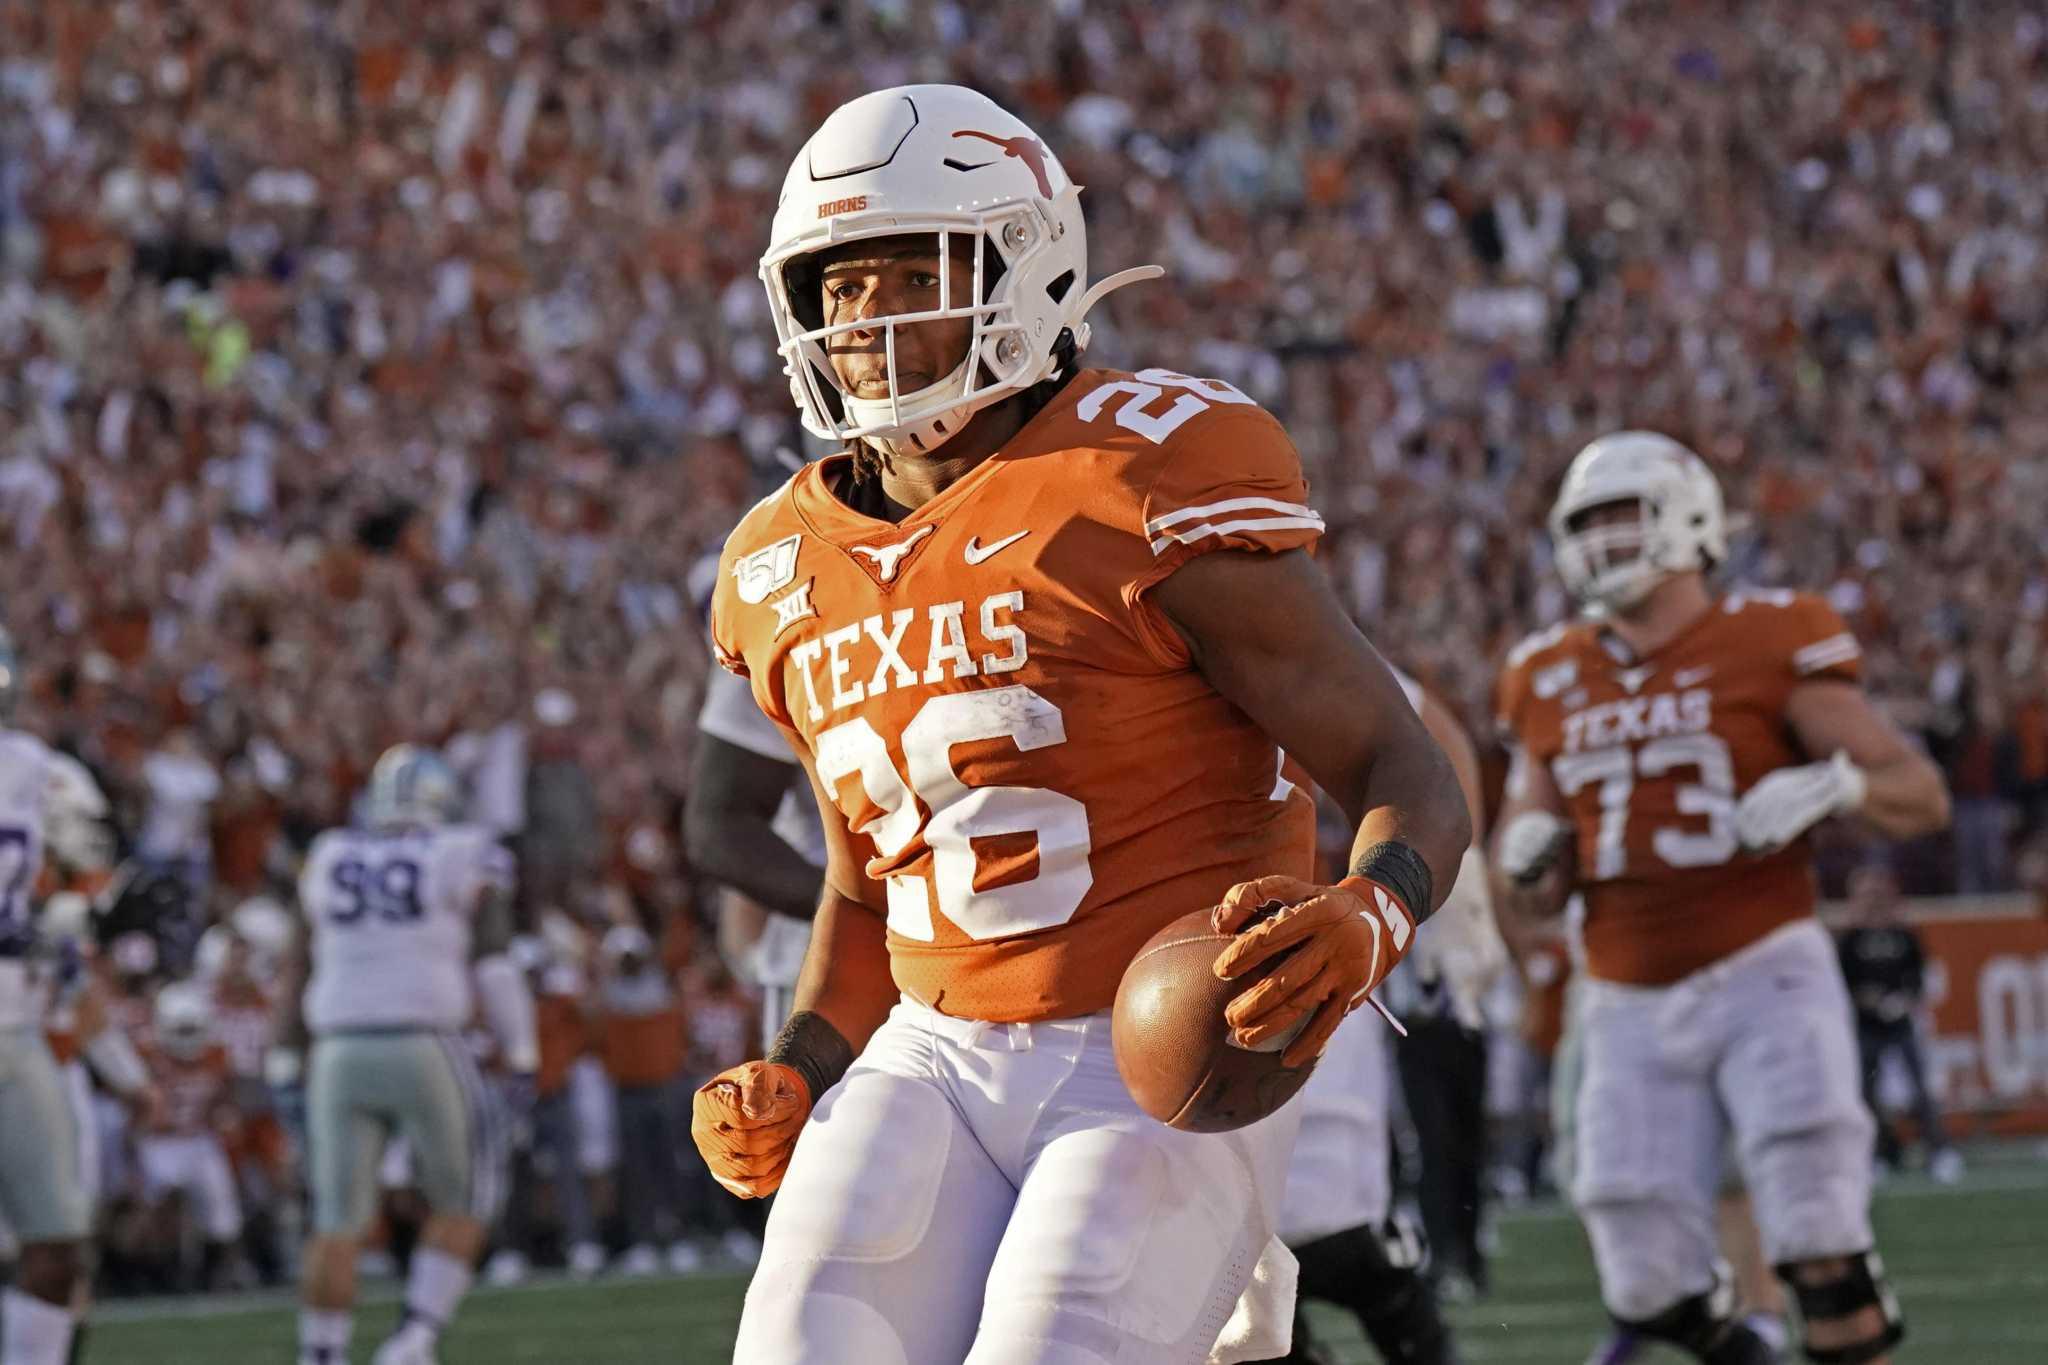 RB Keaontay Ingram hitting his stride for Texas